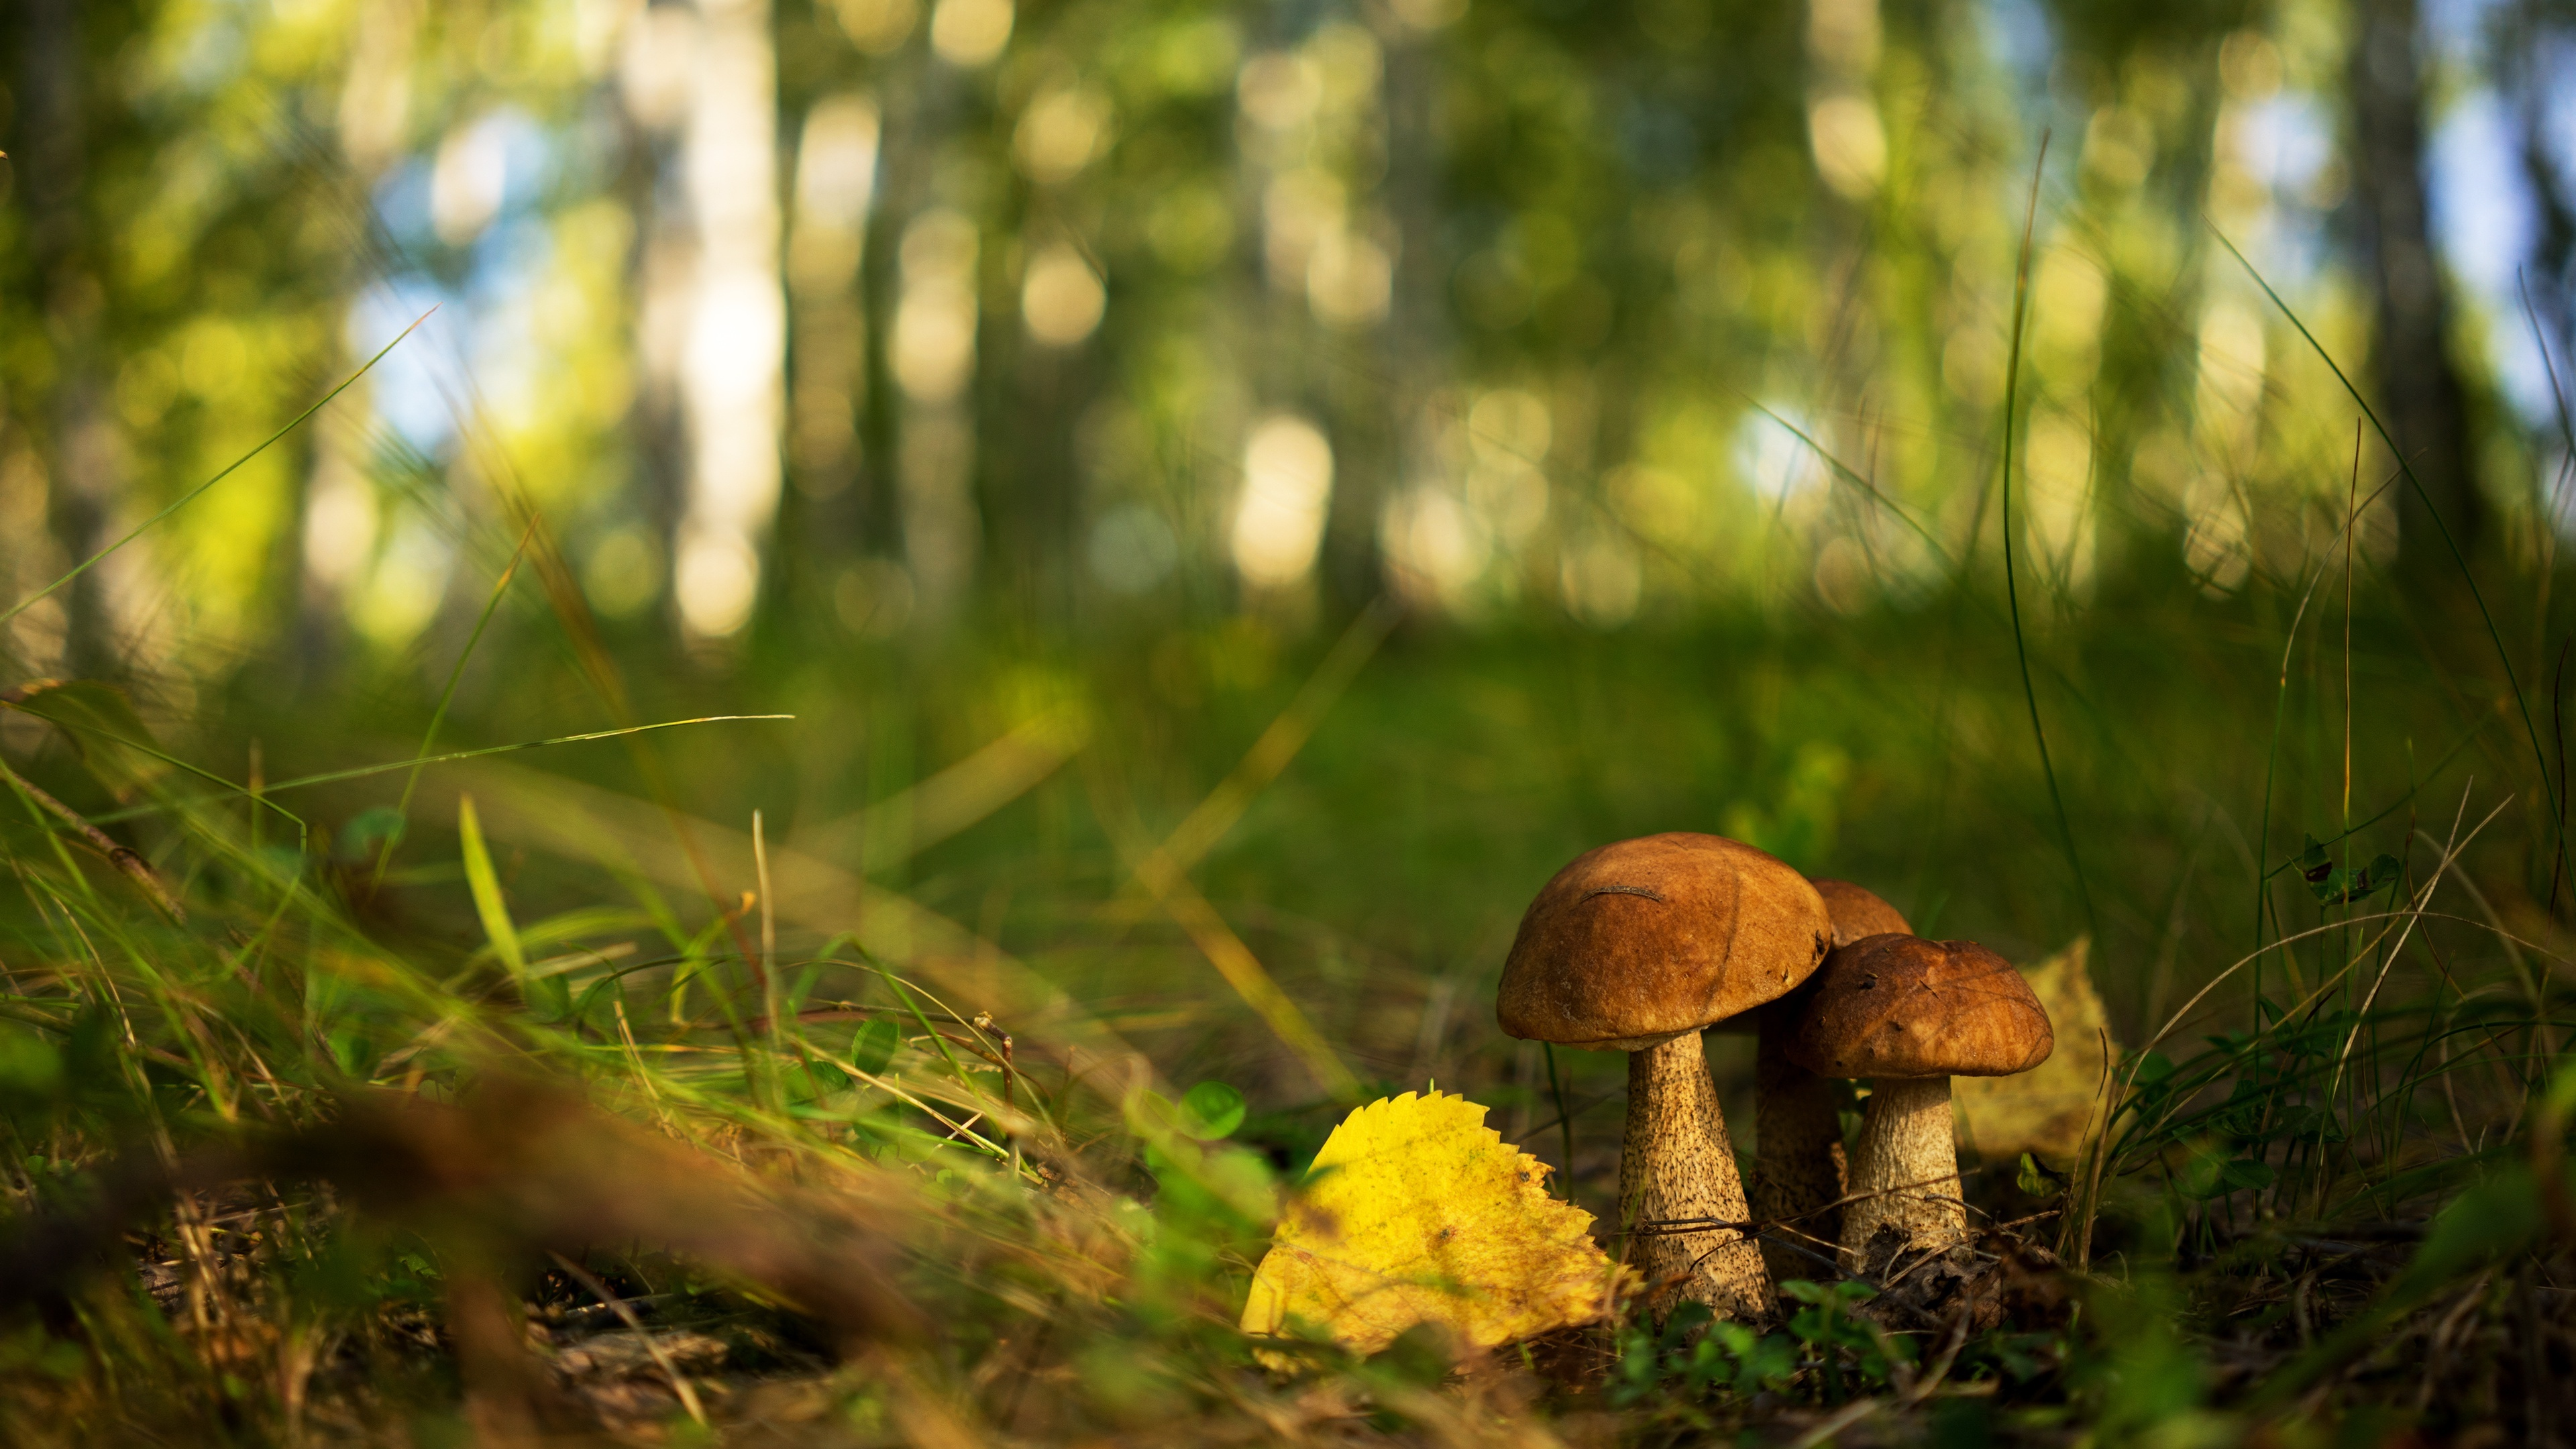 Macro Mushrooms background wallpaper